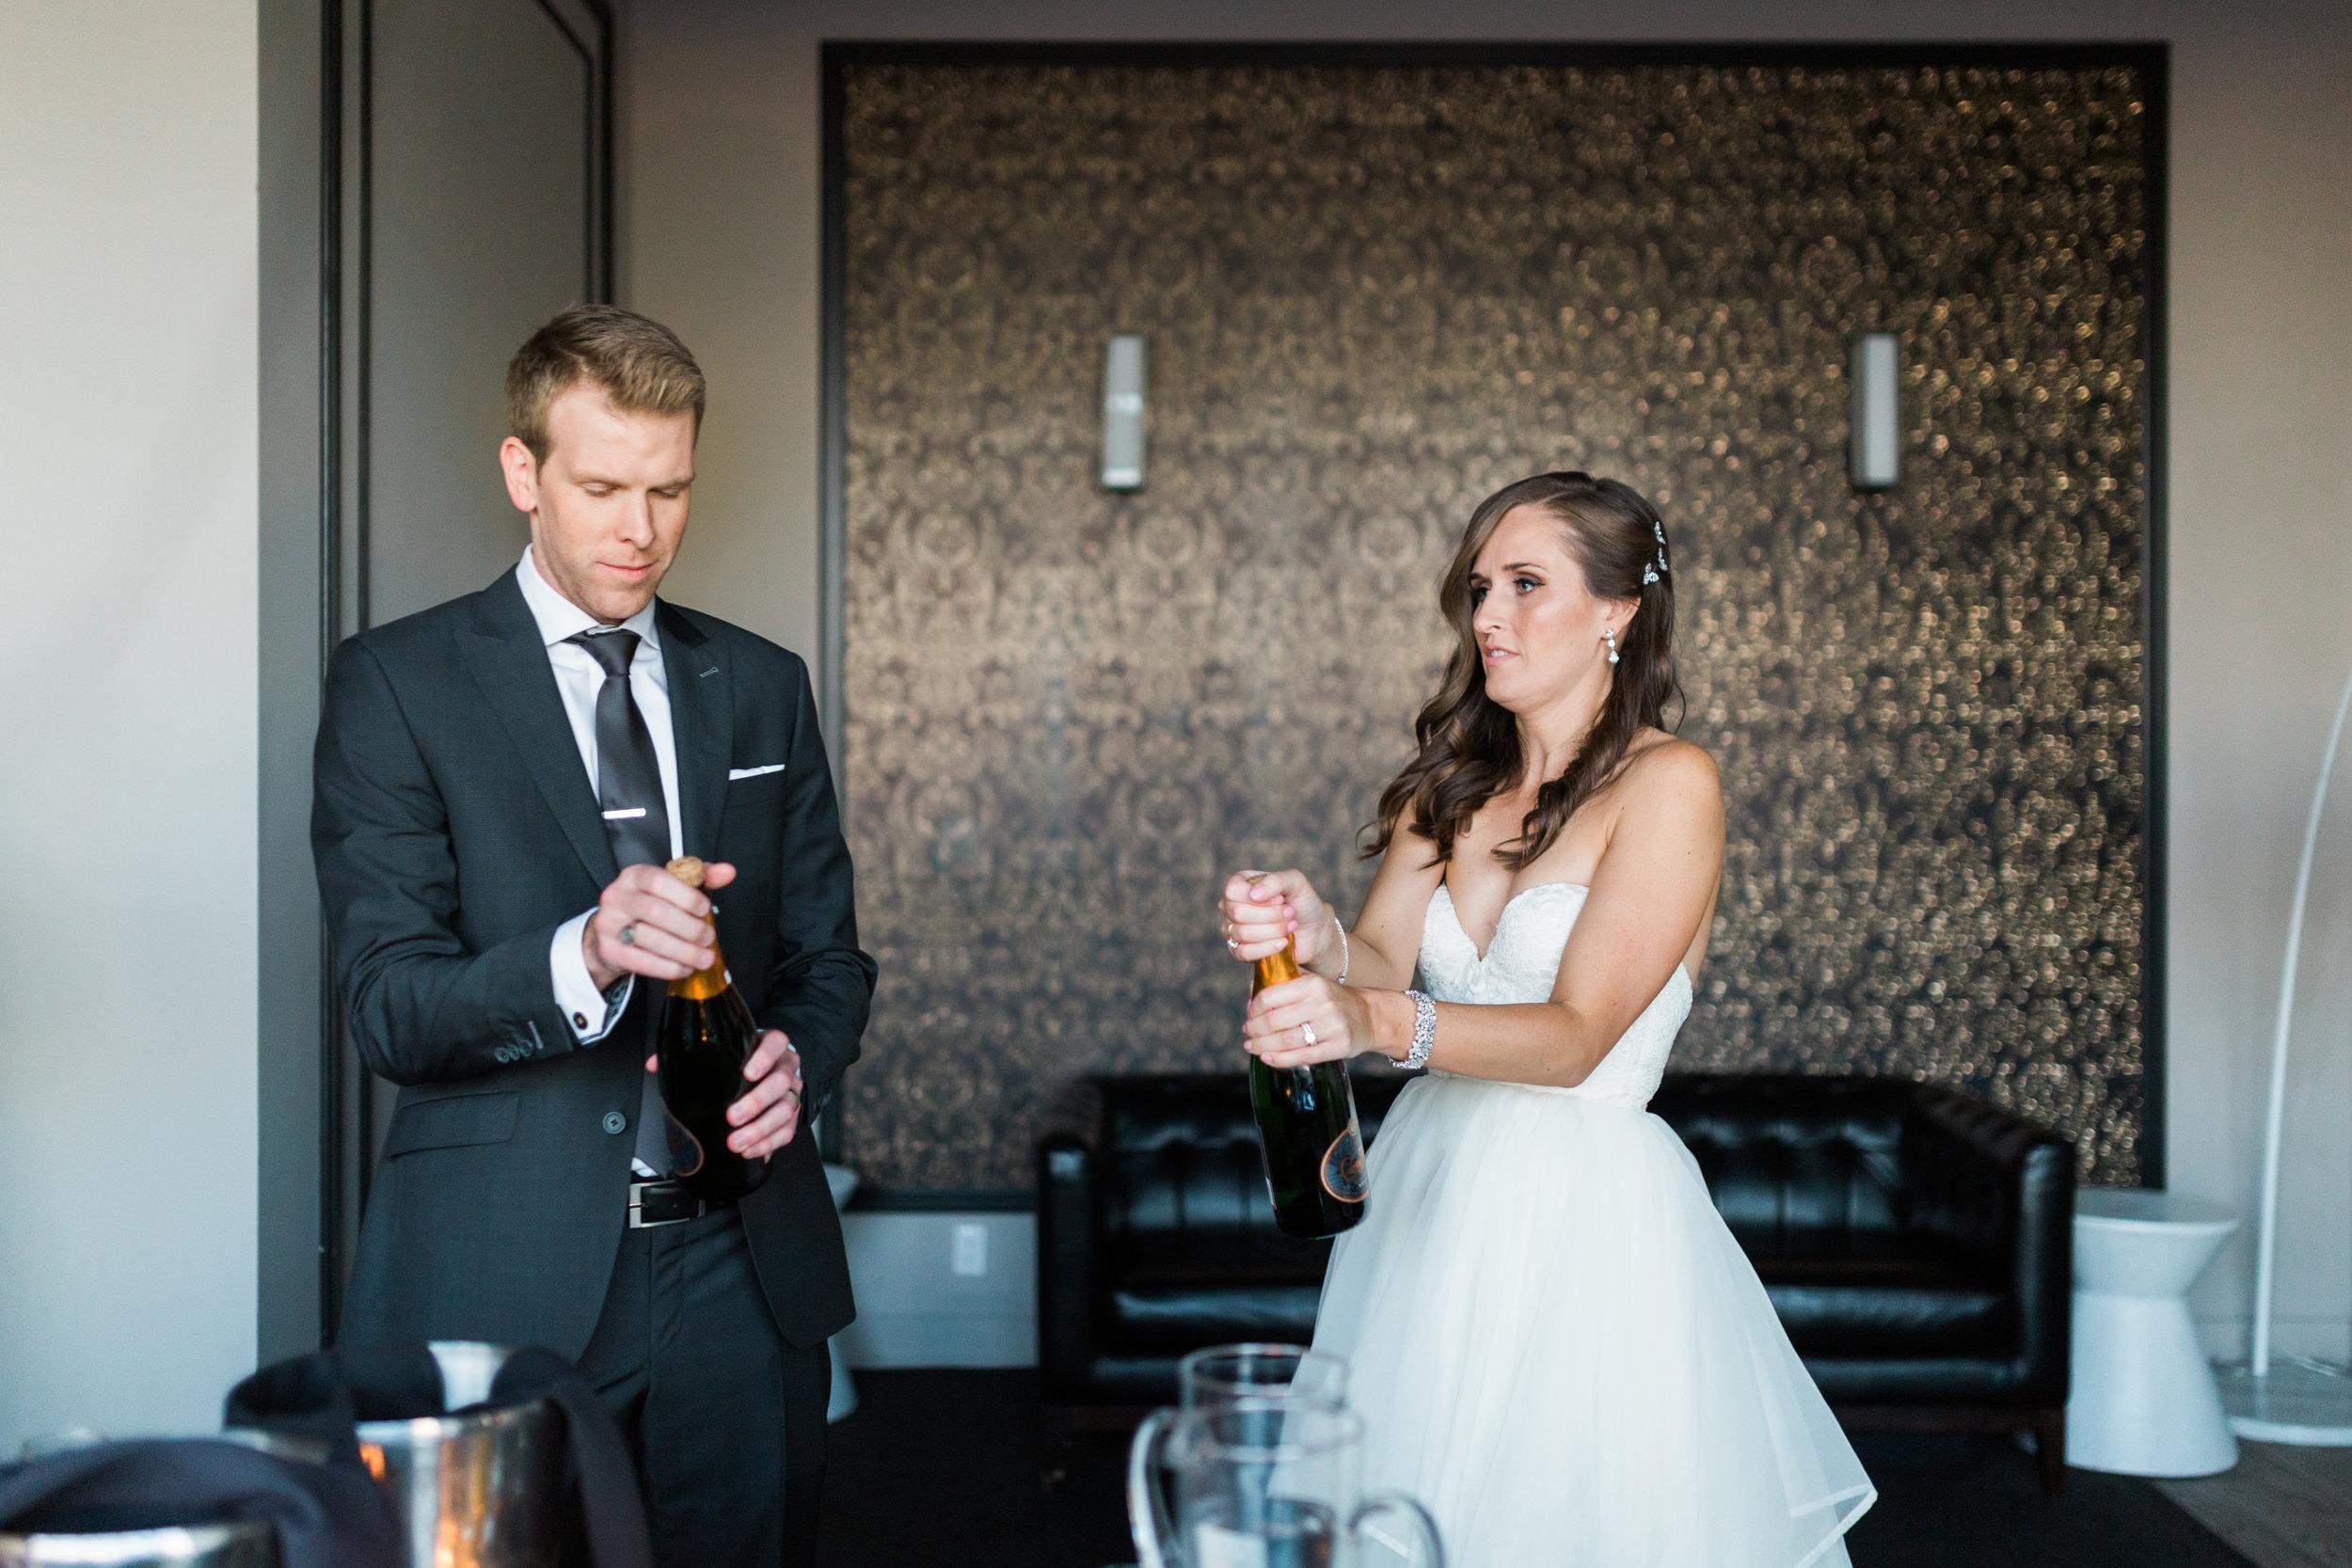 Toronto Fine Art Photographer - 180 Restaurant Wedding - Ceremony-3.jpg